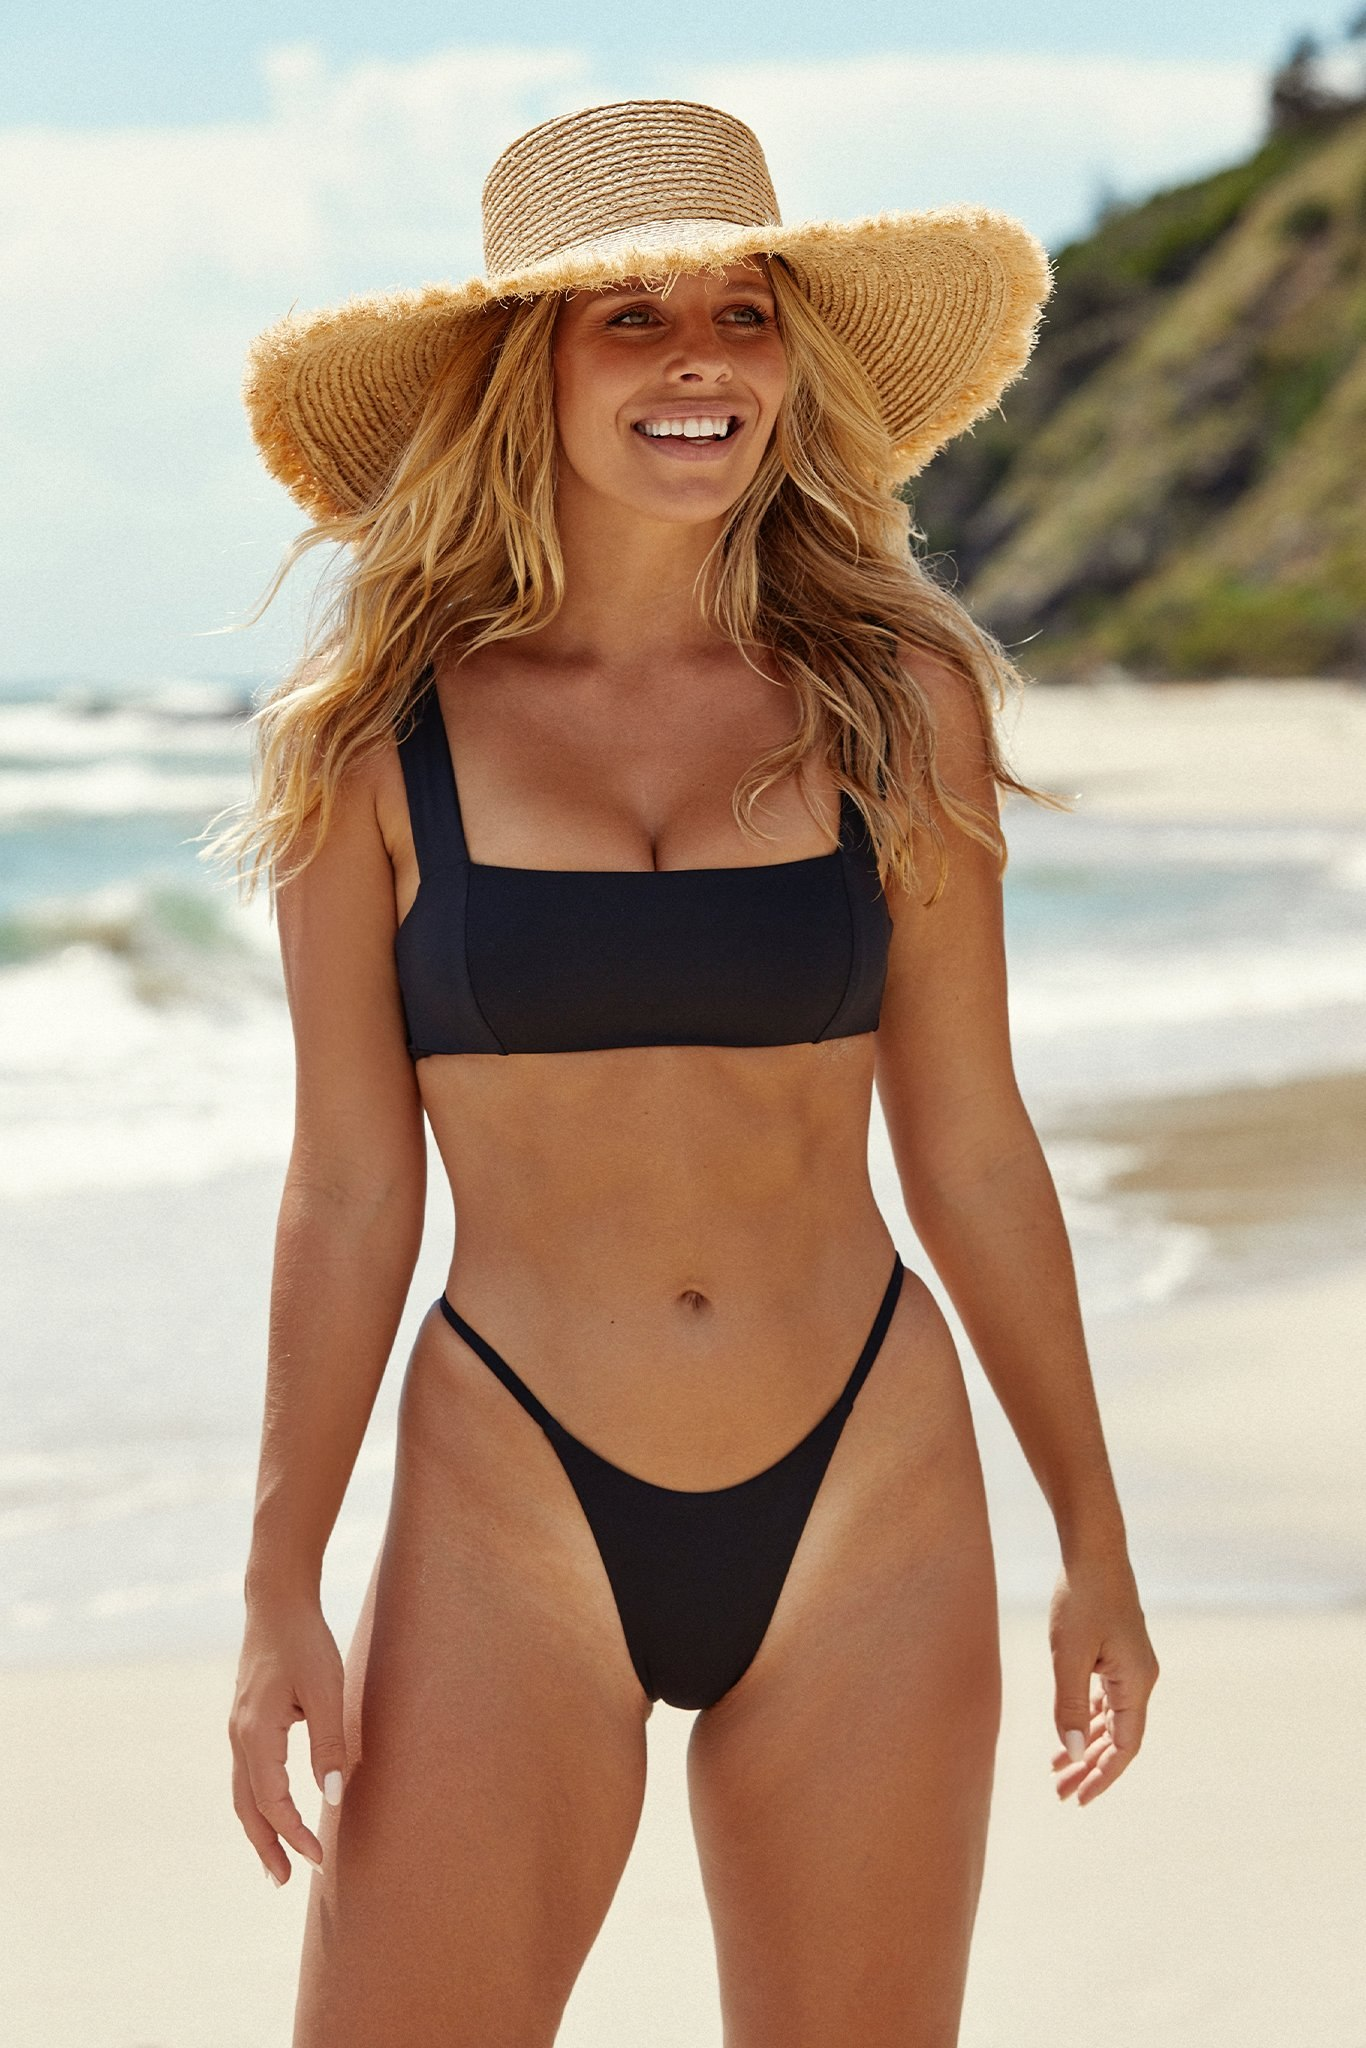 Barbados Bottom by Monday Swimwear, available on mondayswimwear.com for $75 Kendall Jenner Shorts Exact Product